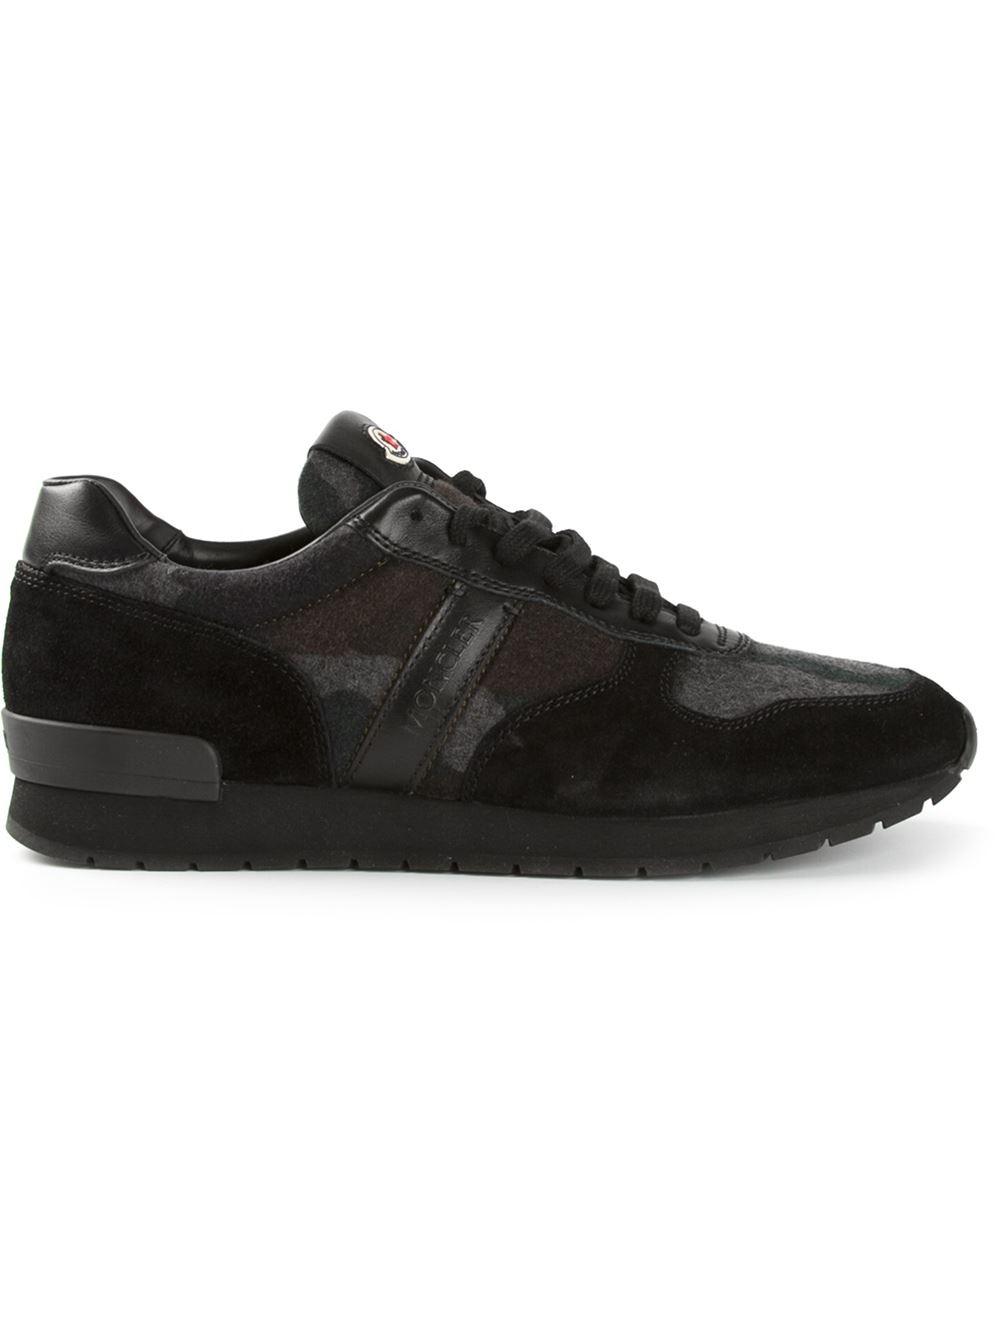 moncler trainers black